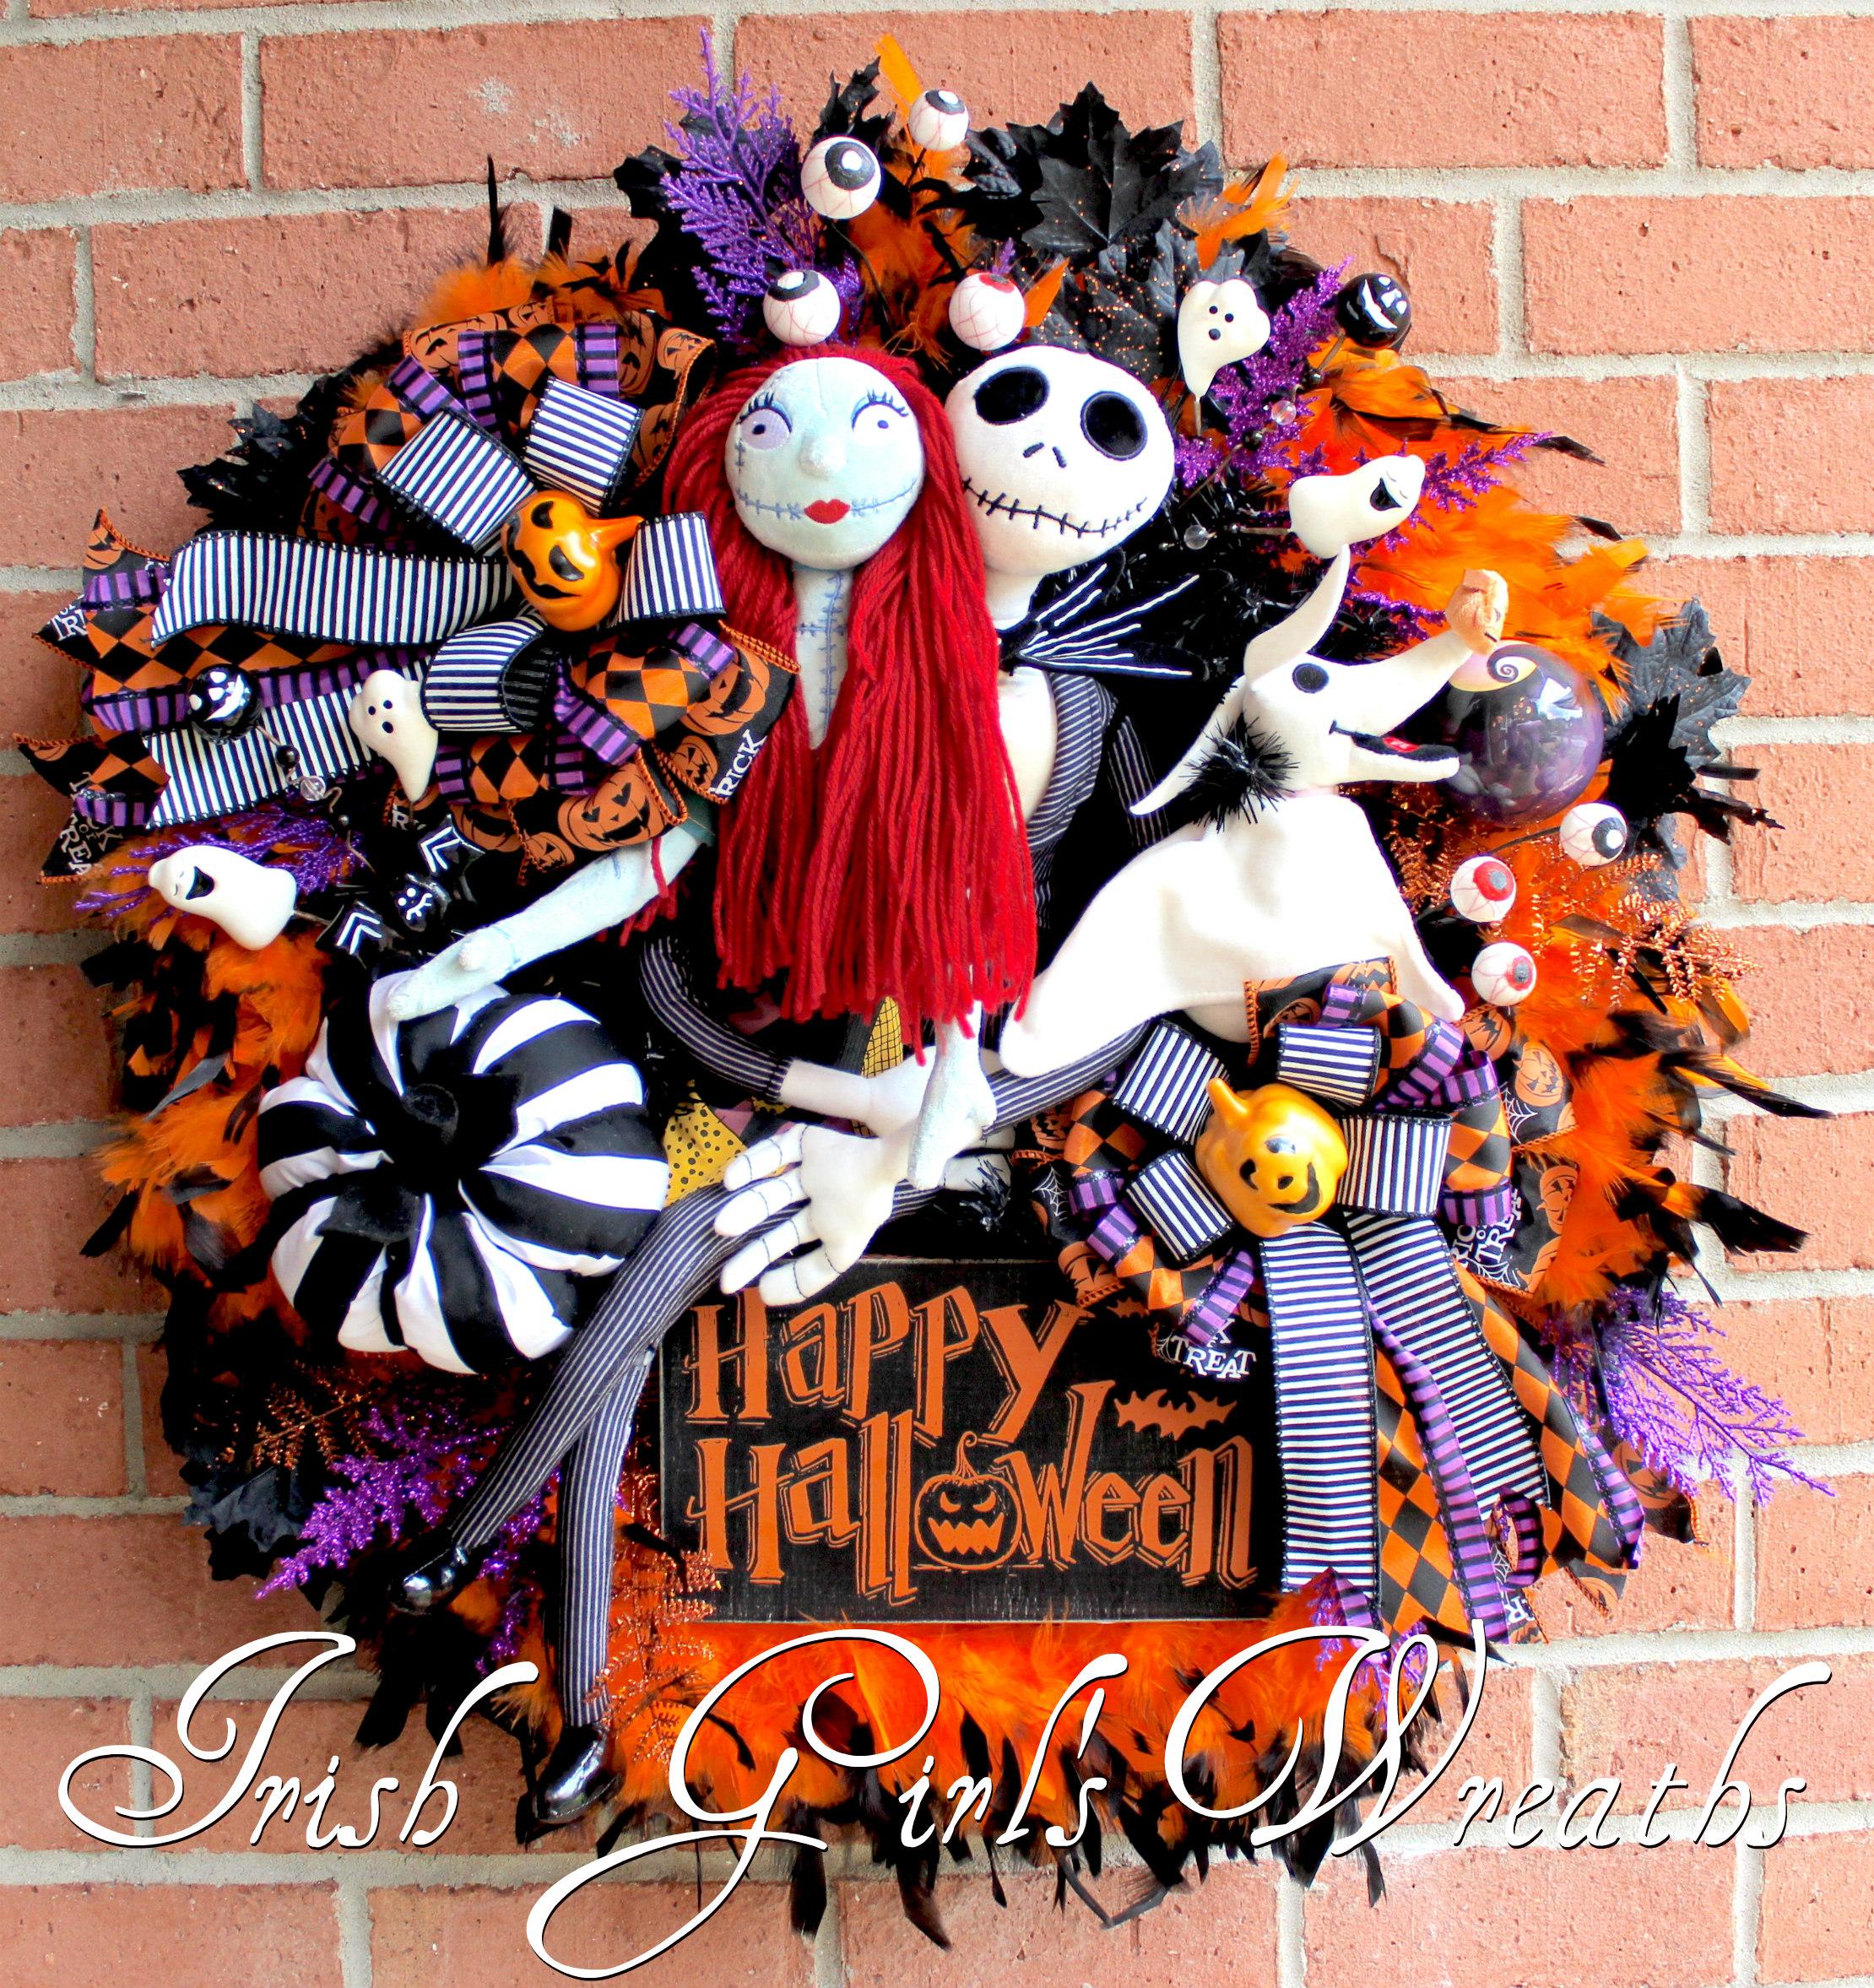 Nightmare Before Christmas decor Jack Skellington Wreath for front door Jack the Pumpkin King Wreath Nightmare Before Christmas Wreath